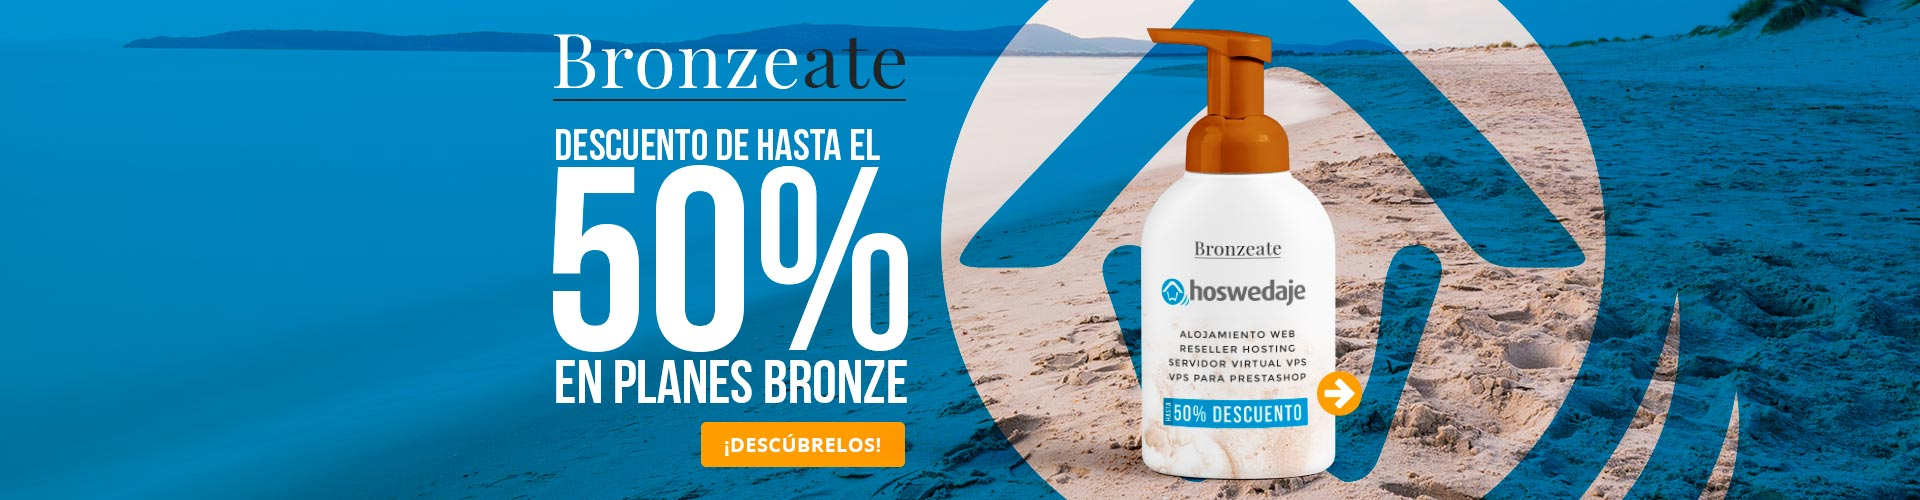 Bronzeate! Hasta 50% de descuento en Planes Bronze